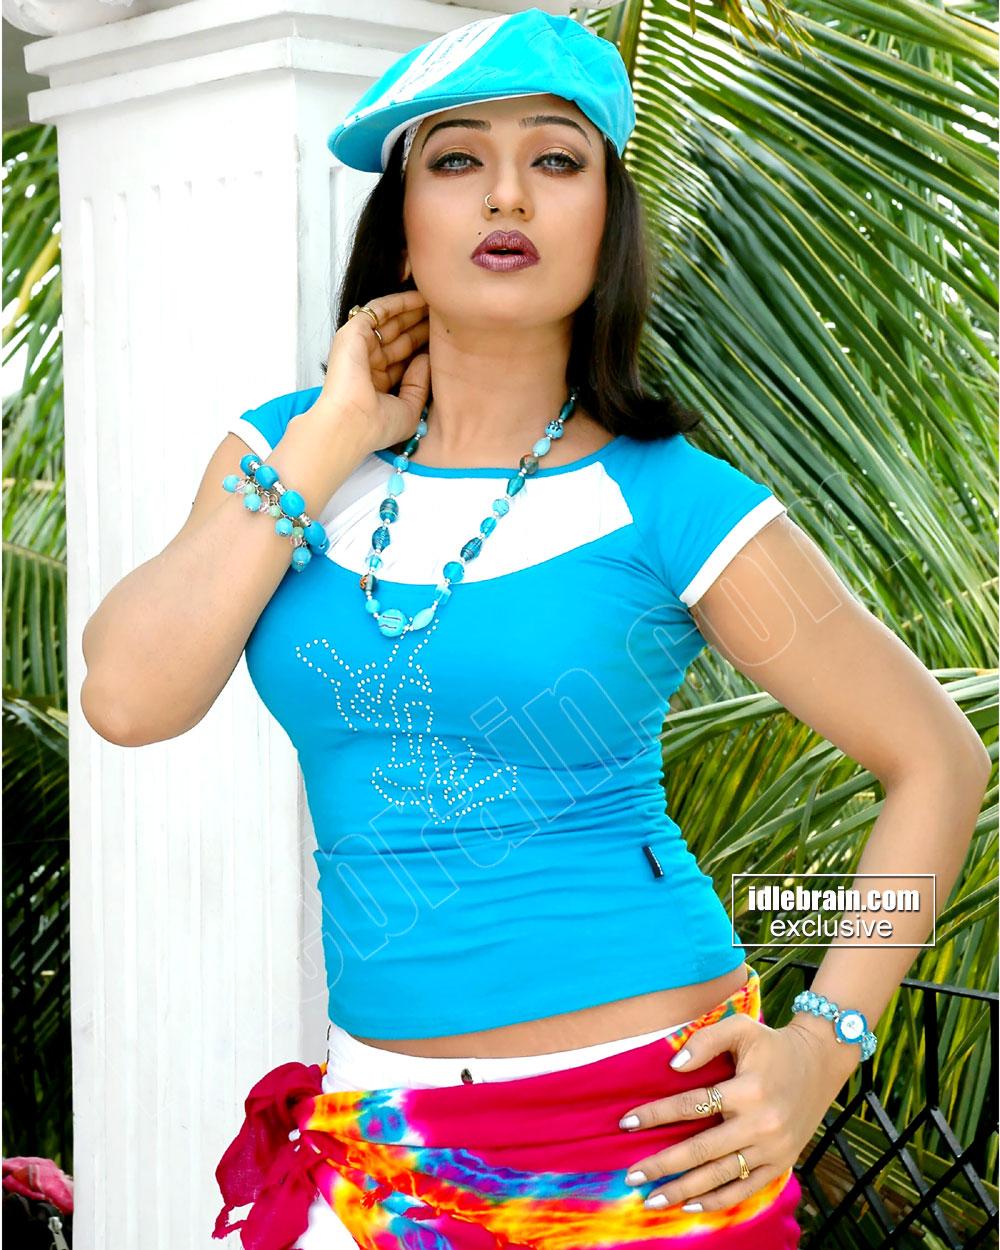 ramyasri23 Tamil Actress Ranjitha Photo Gallery. Tuesday, April 12, 2011